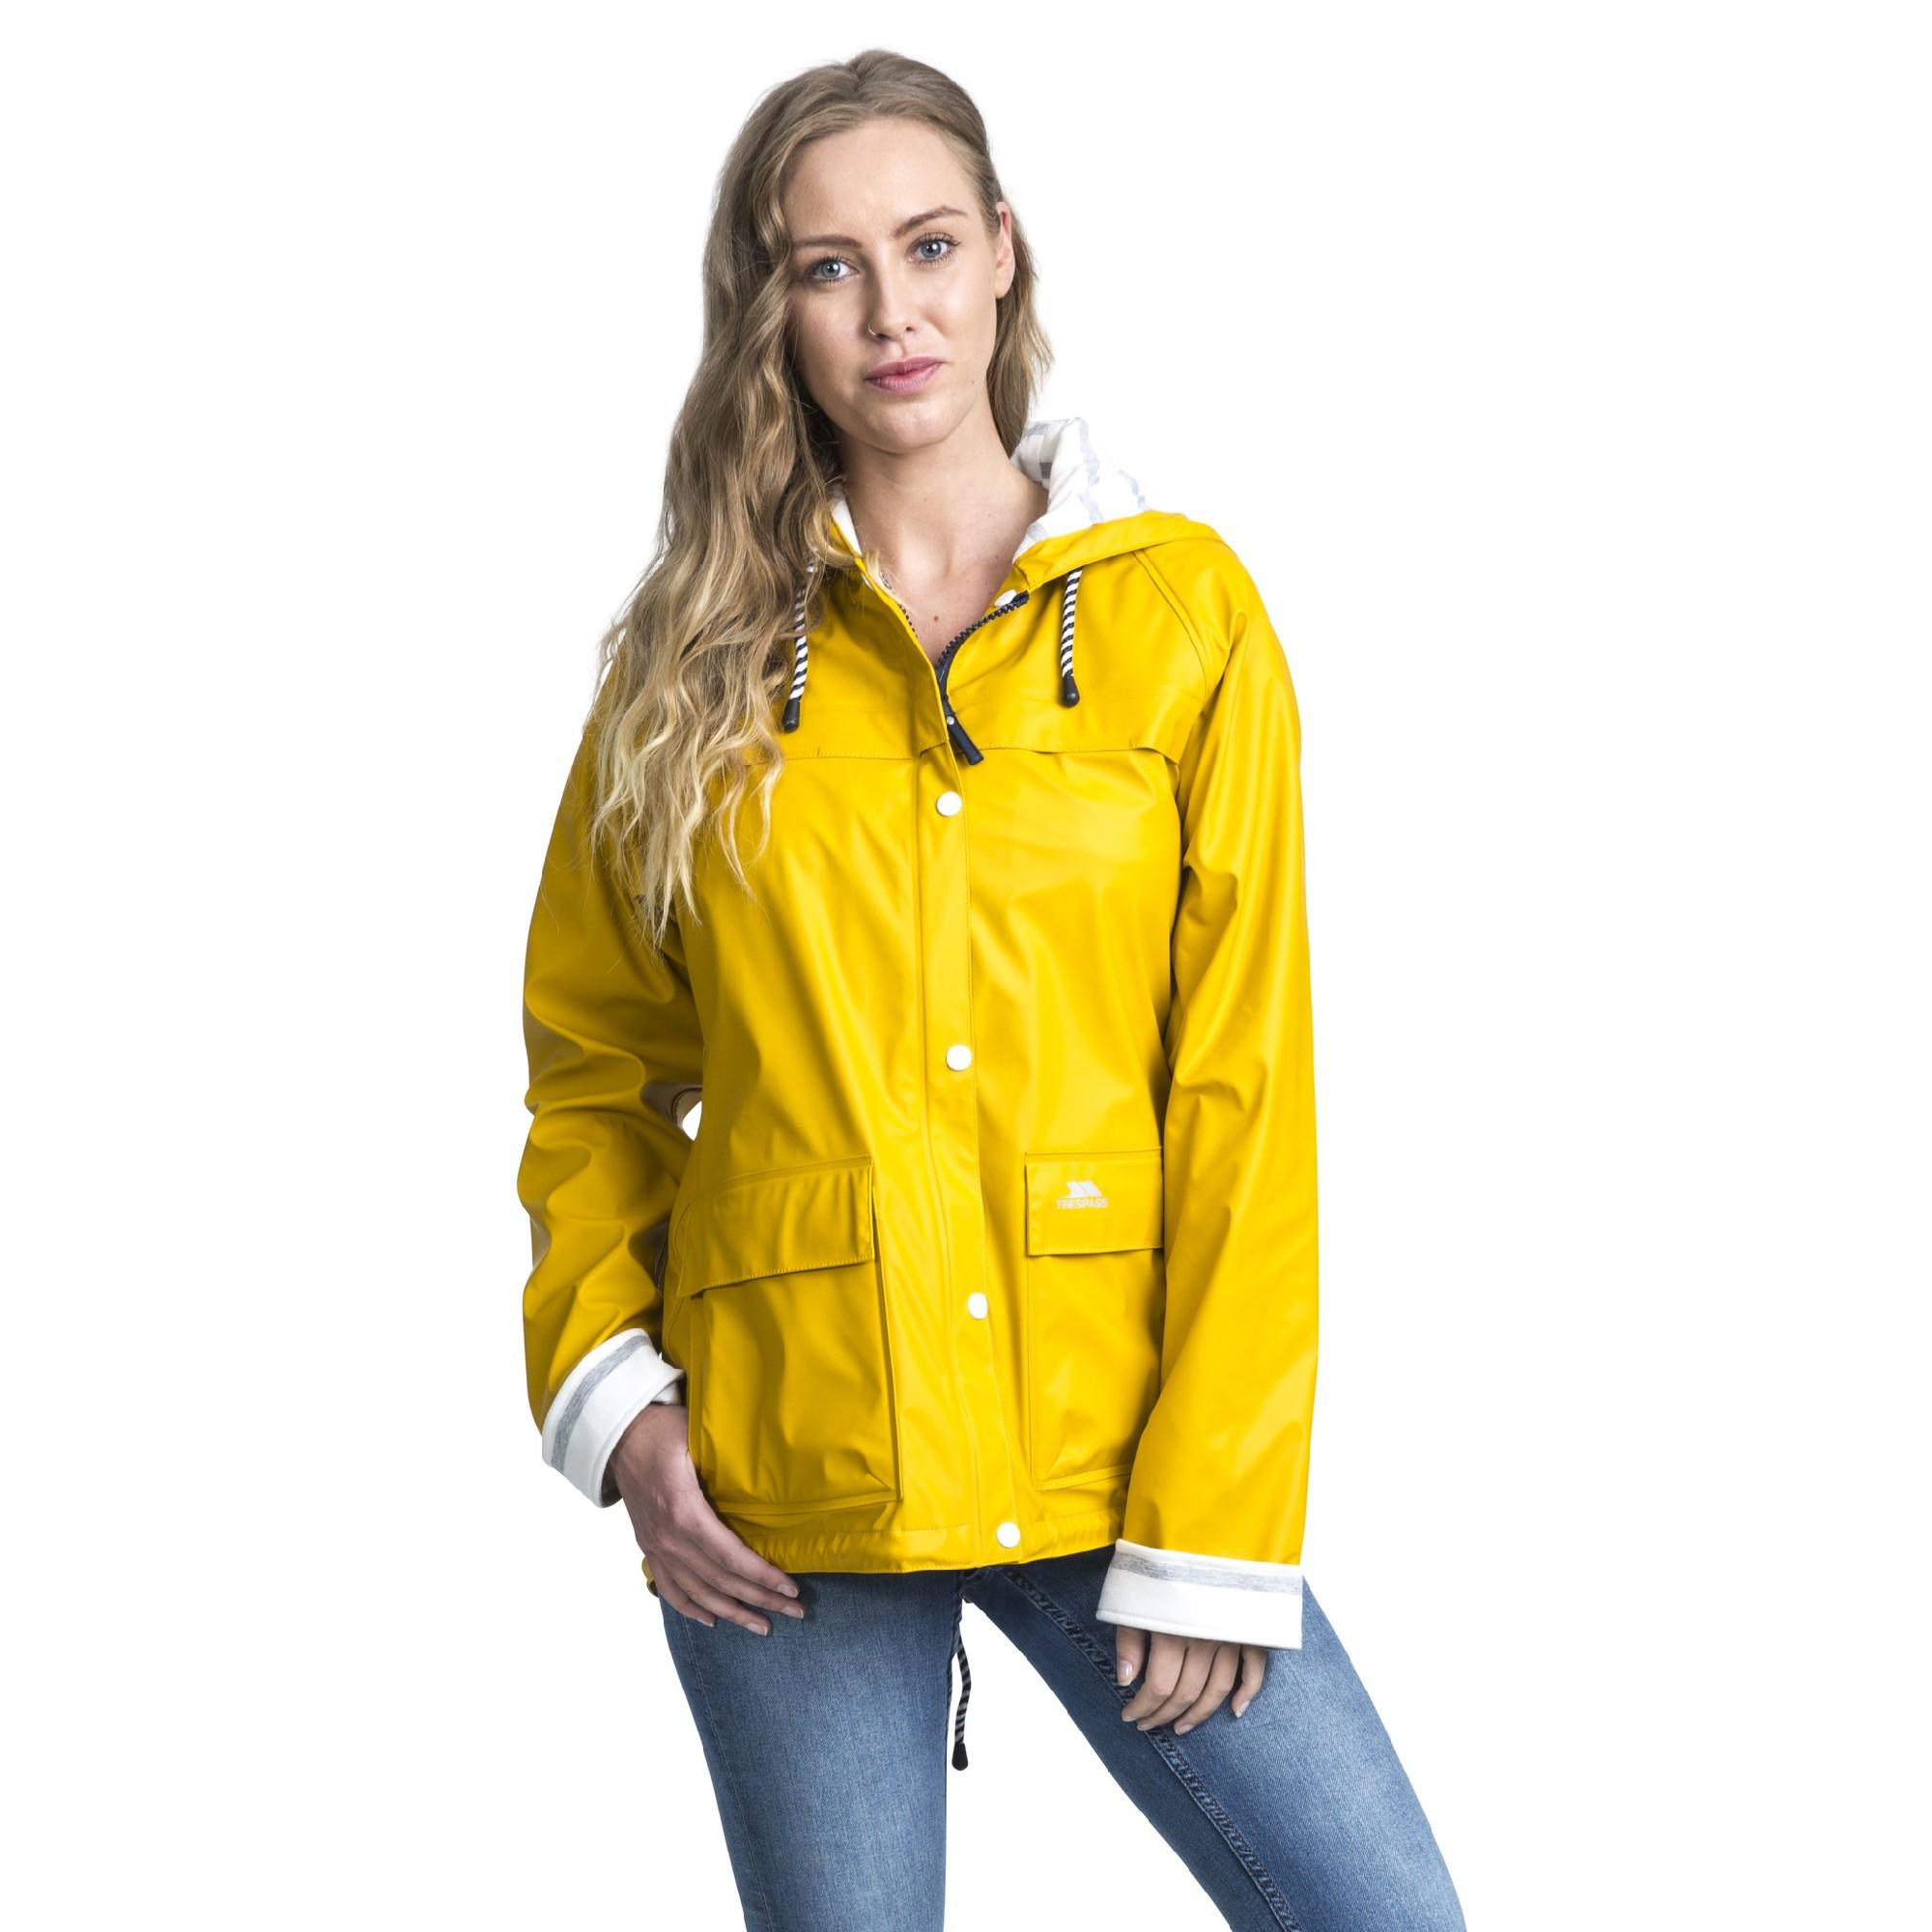 Trespass-Womens-Ladies-Muddle-Waterproof-Jacket-TP3991 thumbnail 4